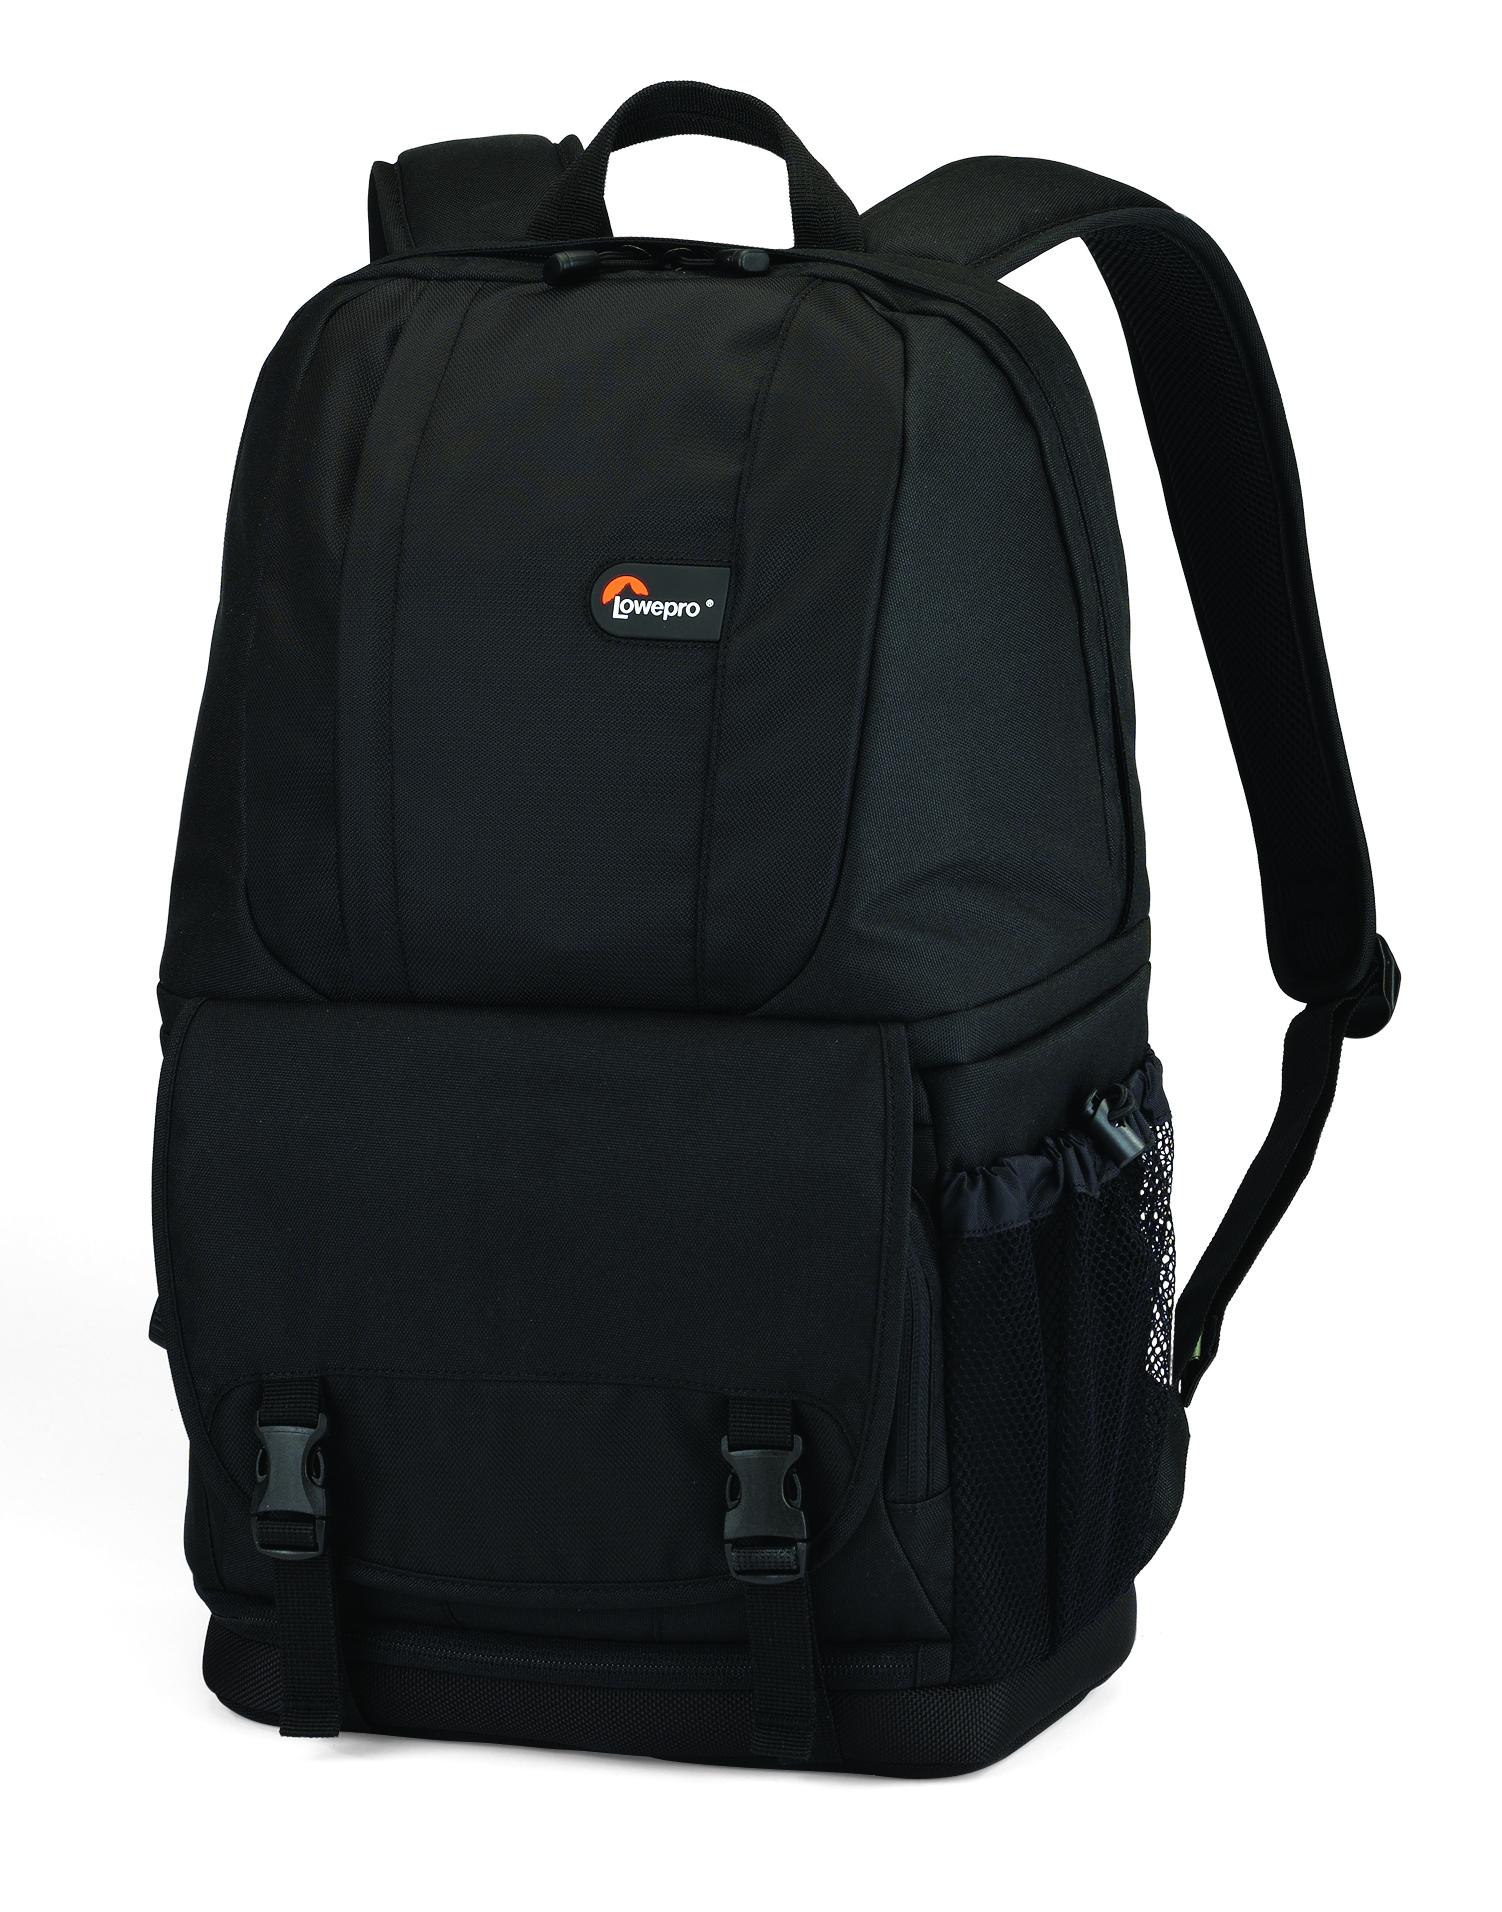 Сумка для фотоаппарата lowepro fastpack 200 black.